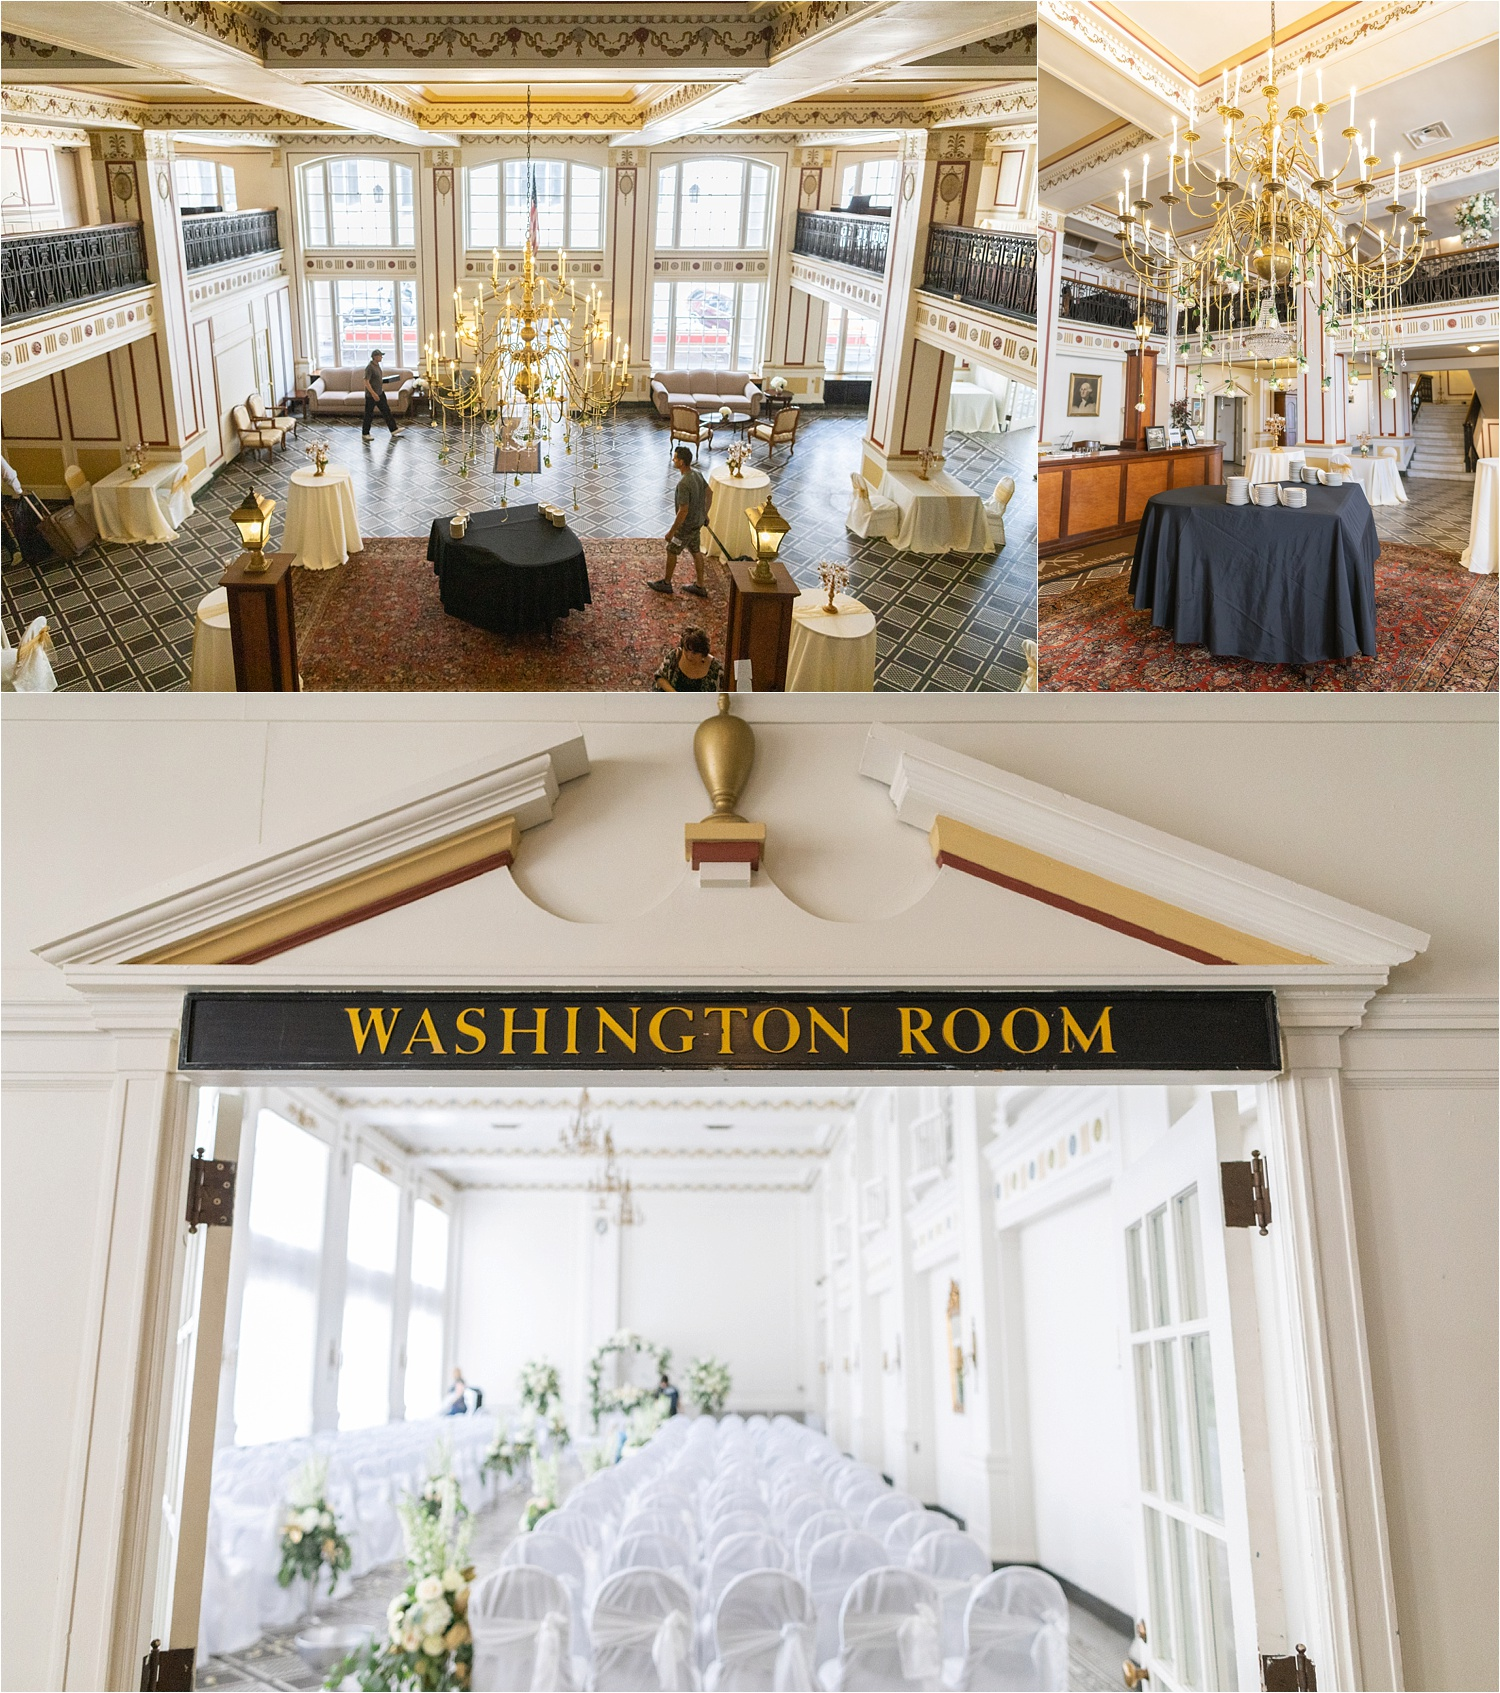 the washington room at the george washington hotel in washington pa